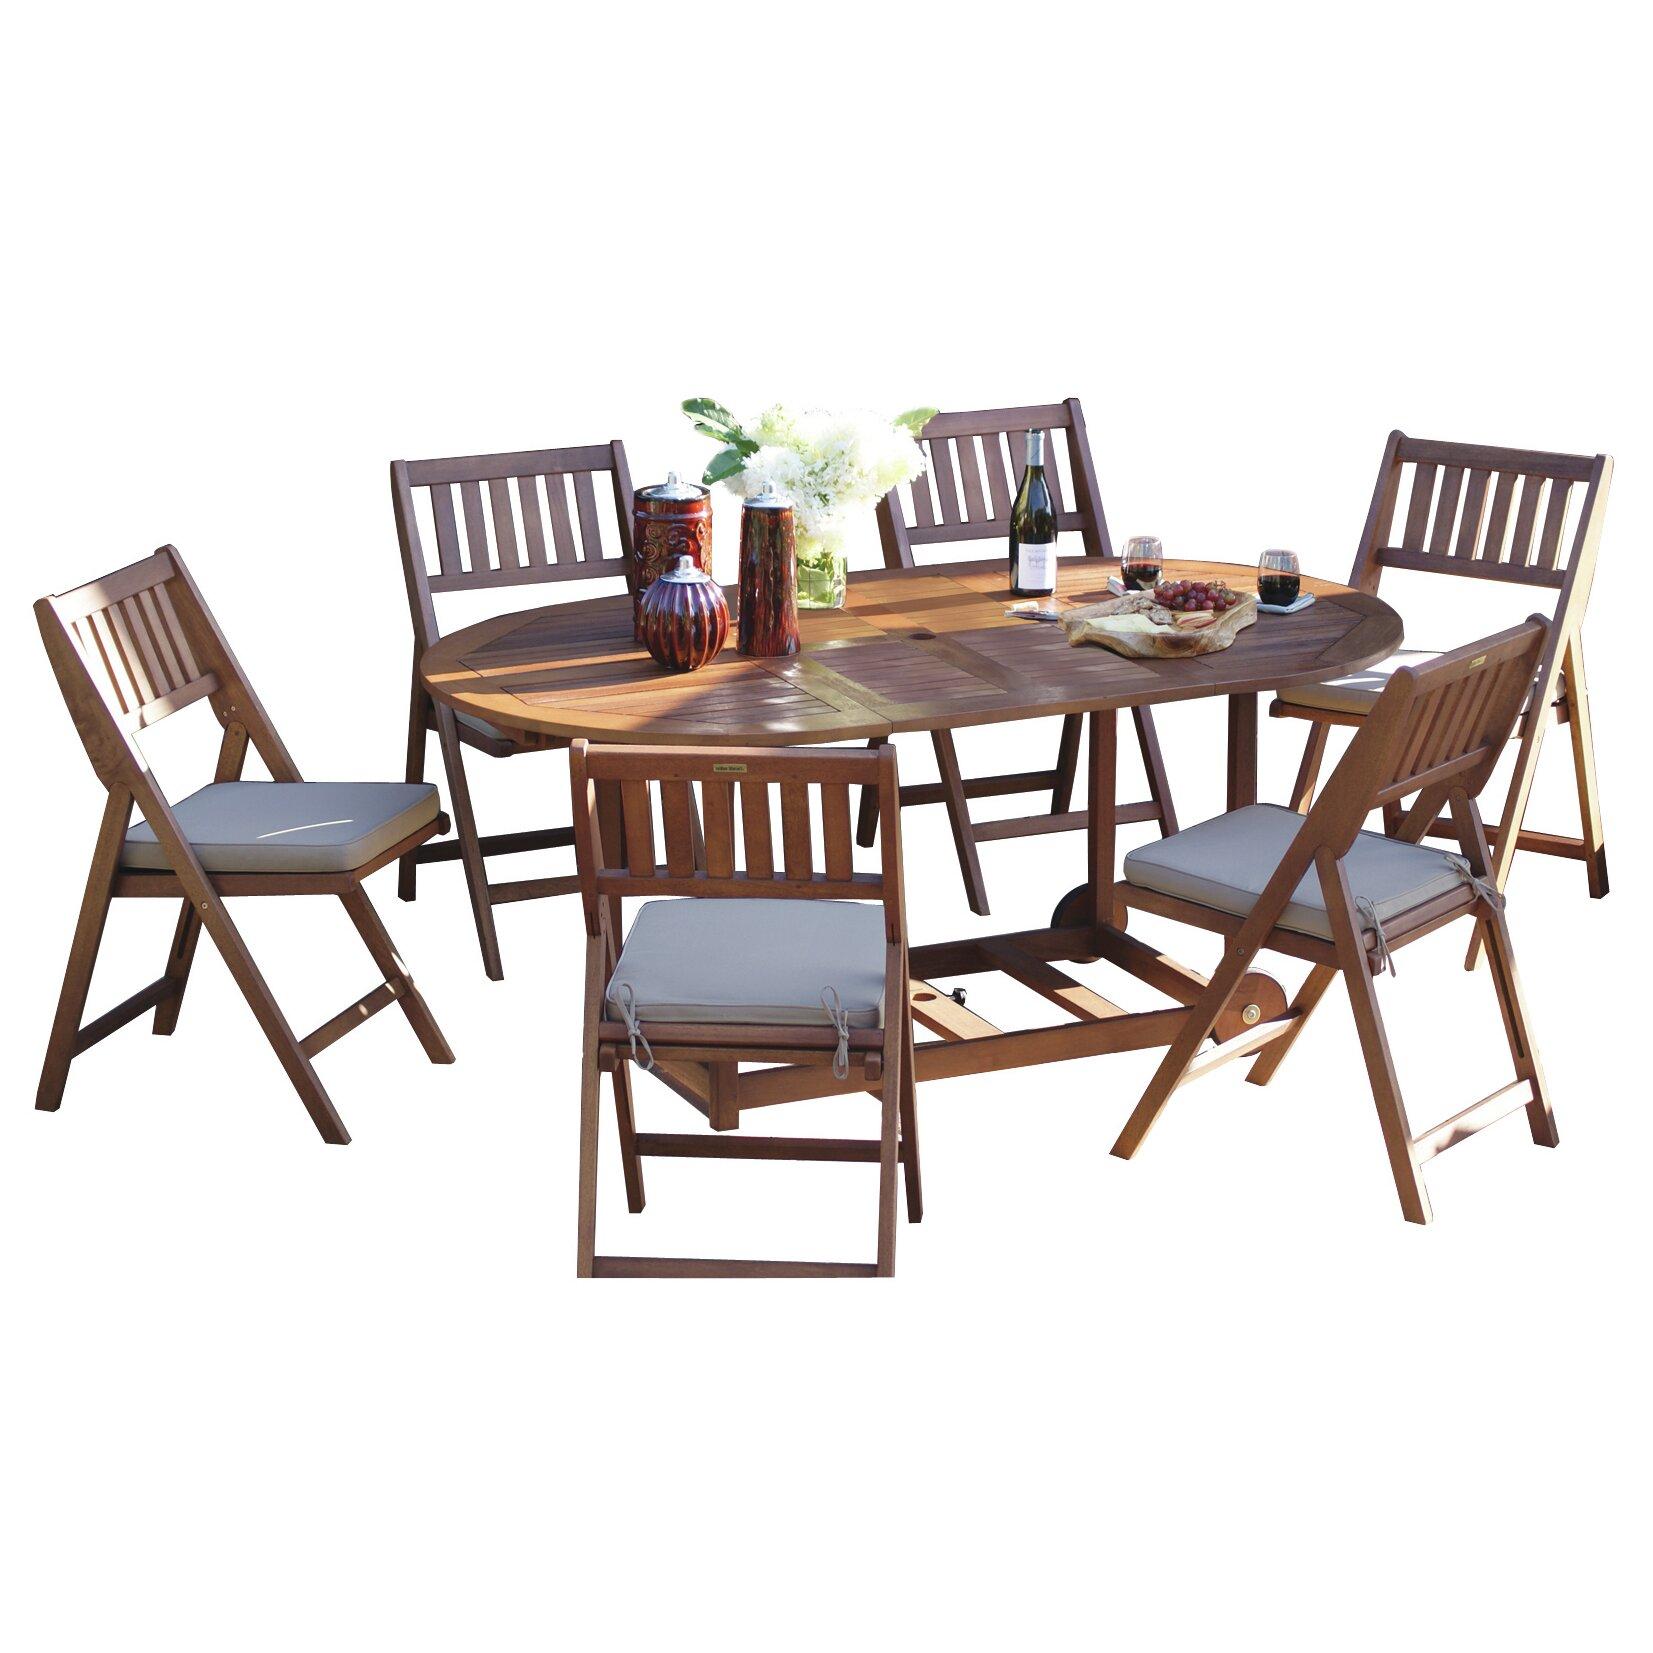 7 Piece Dining Set With Cushions Joss Main